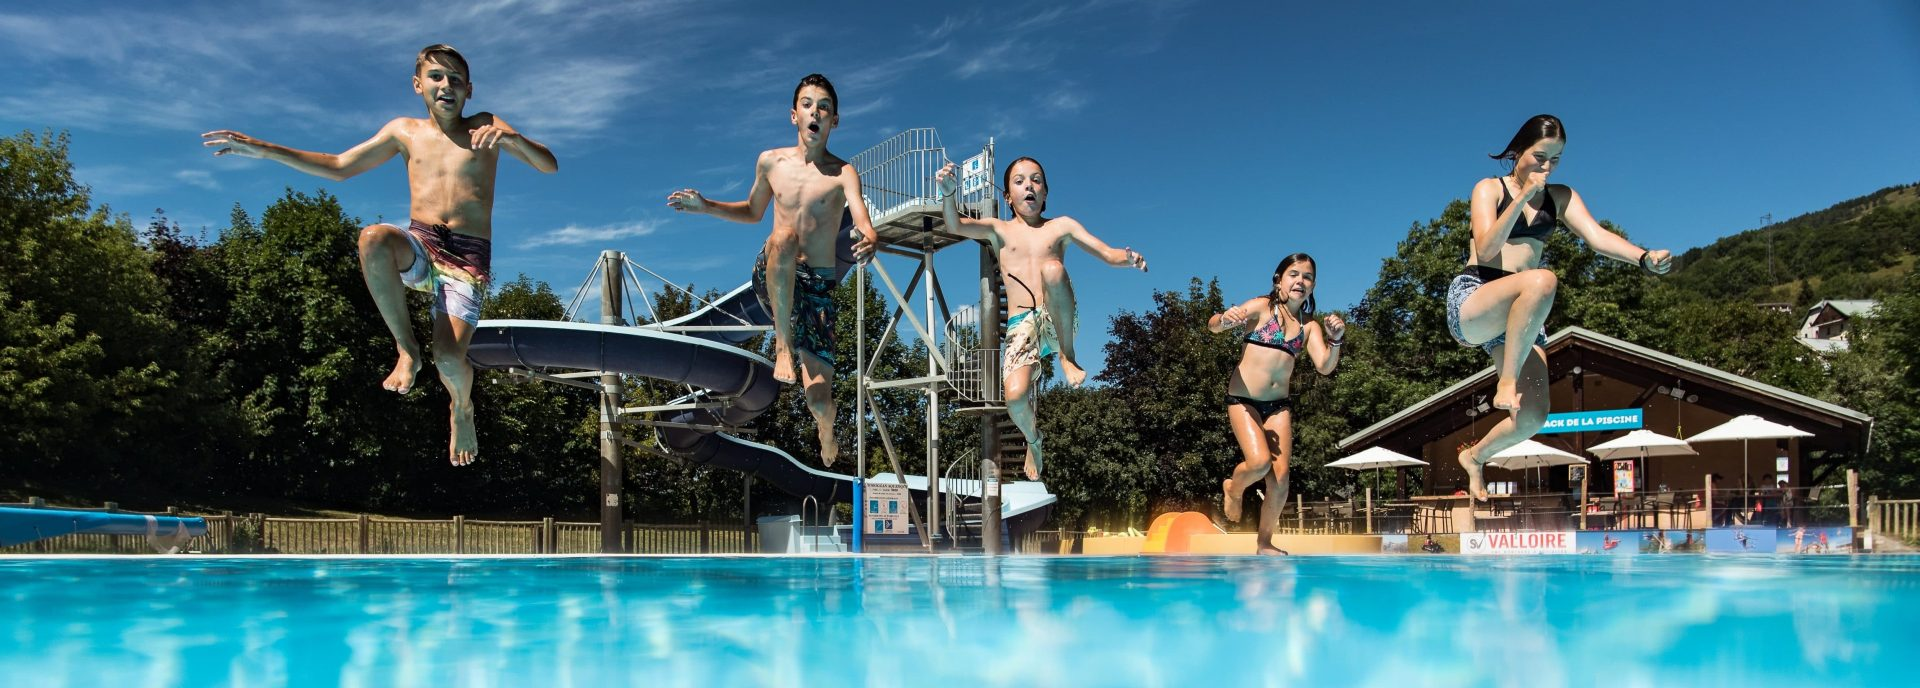 piscine-enfants-valloire-galibier-ete